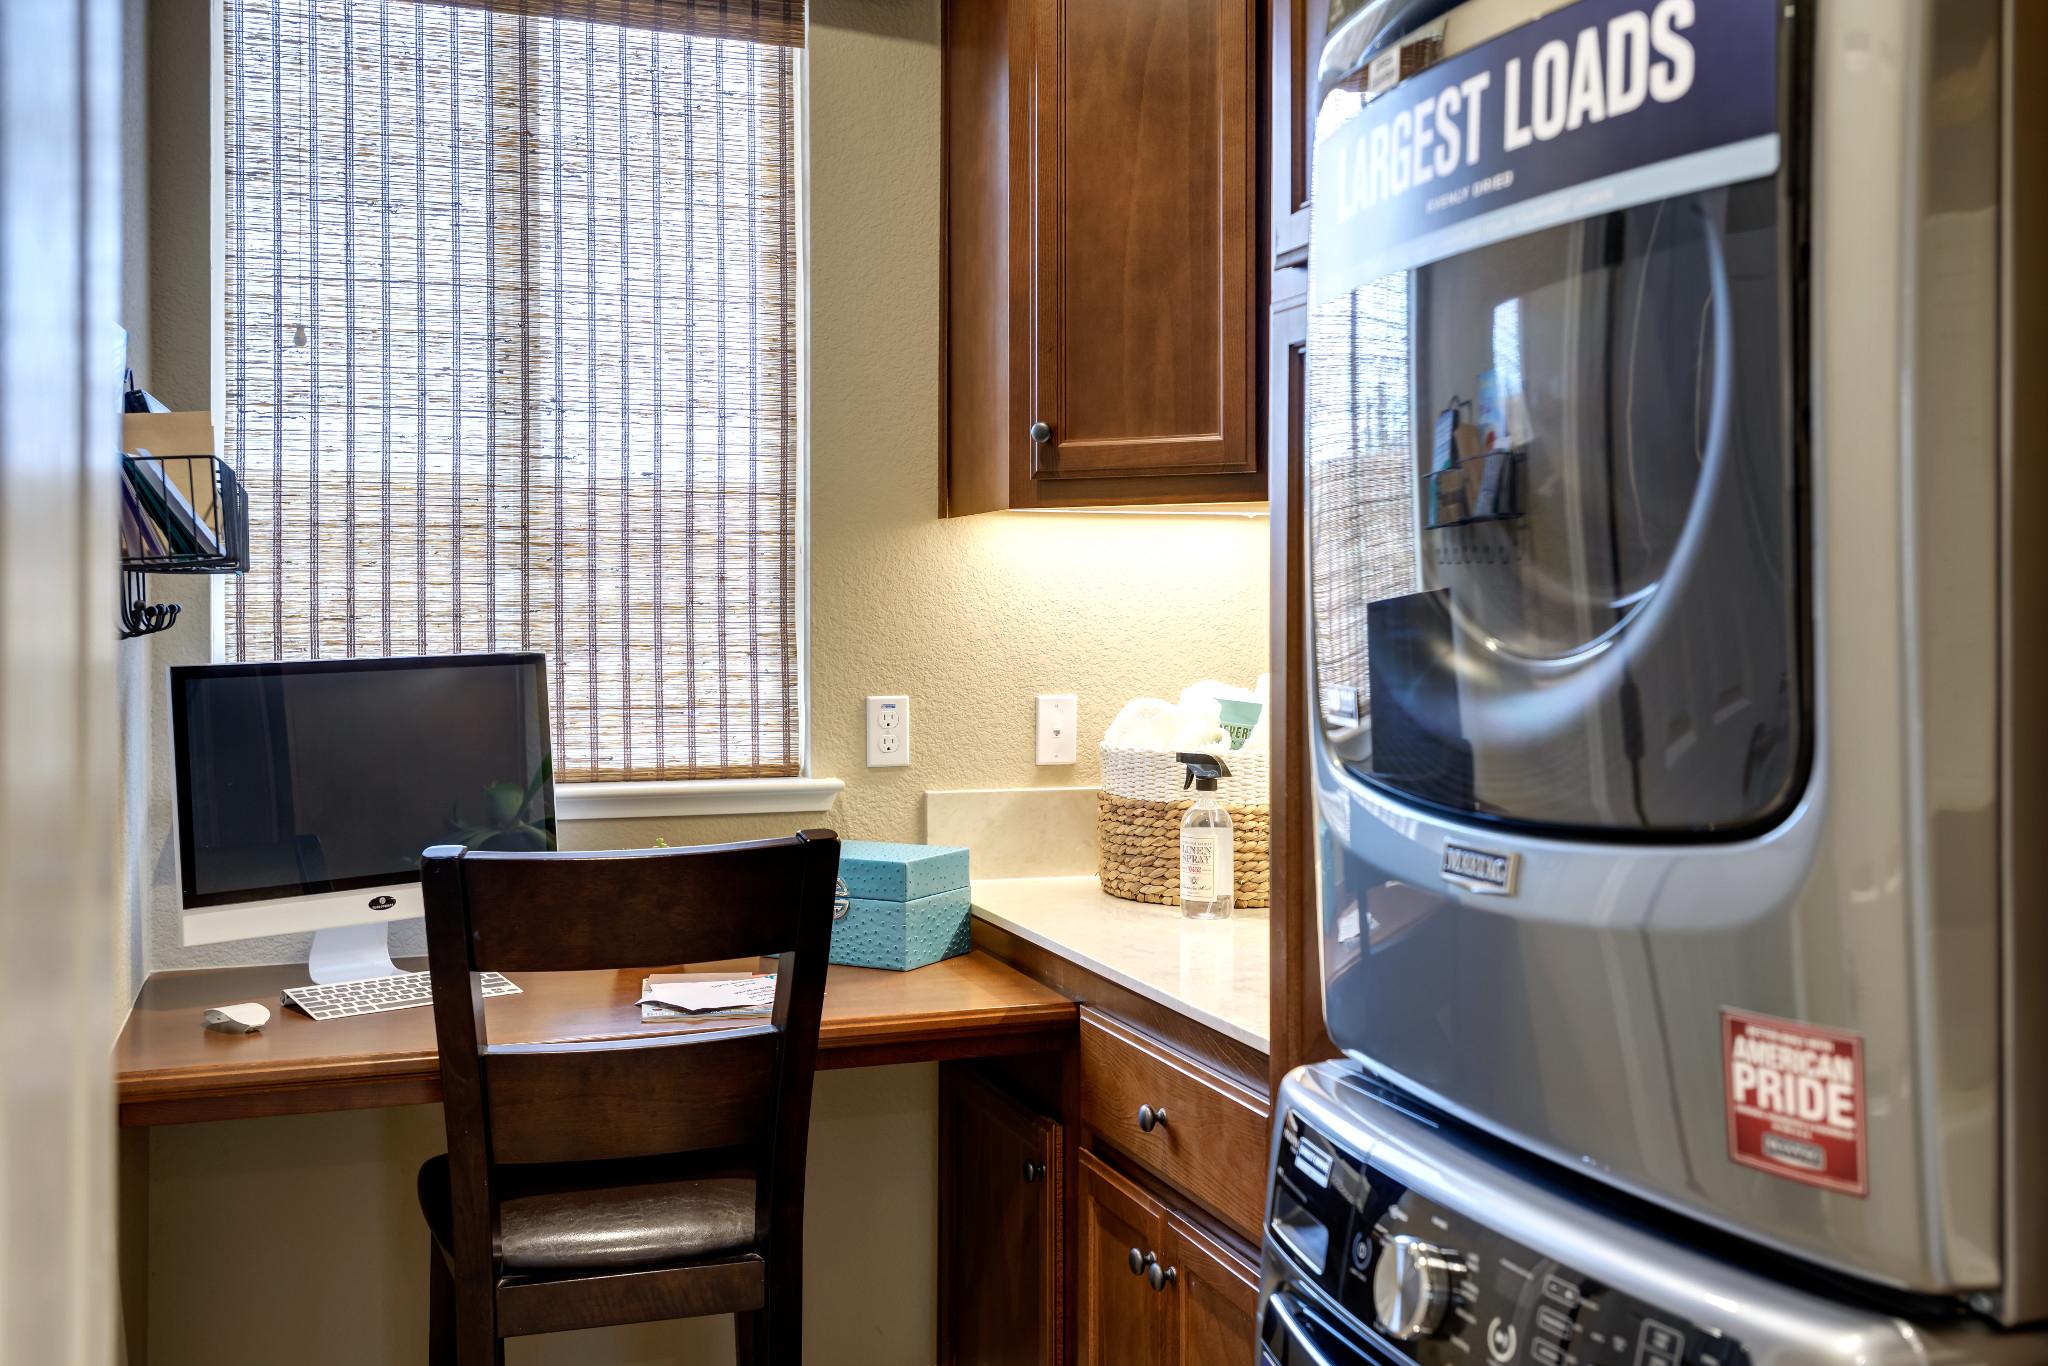 Trilogy Rio Vista Reflect Laundry Room